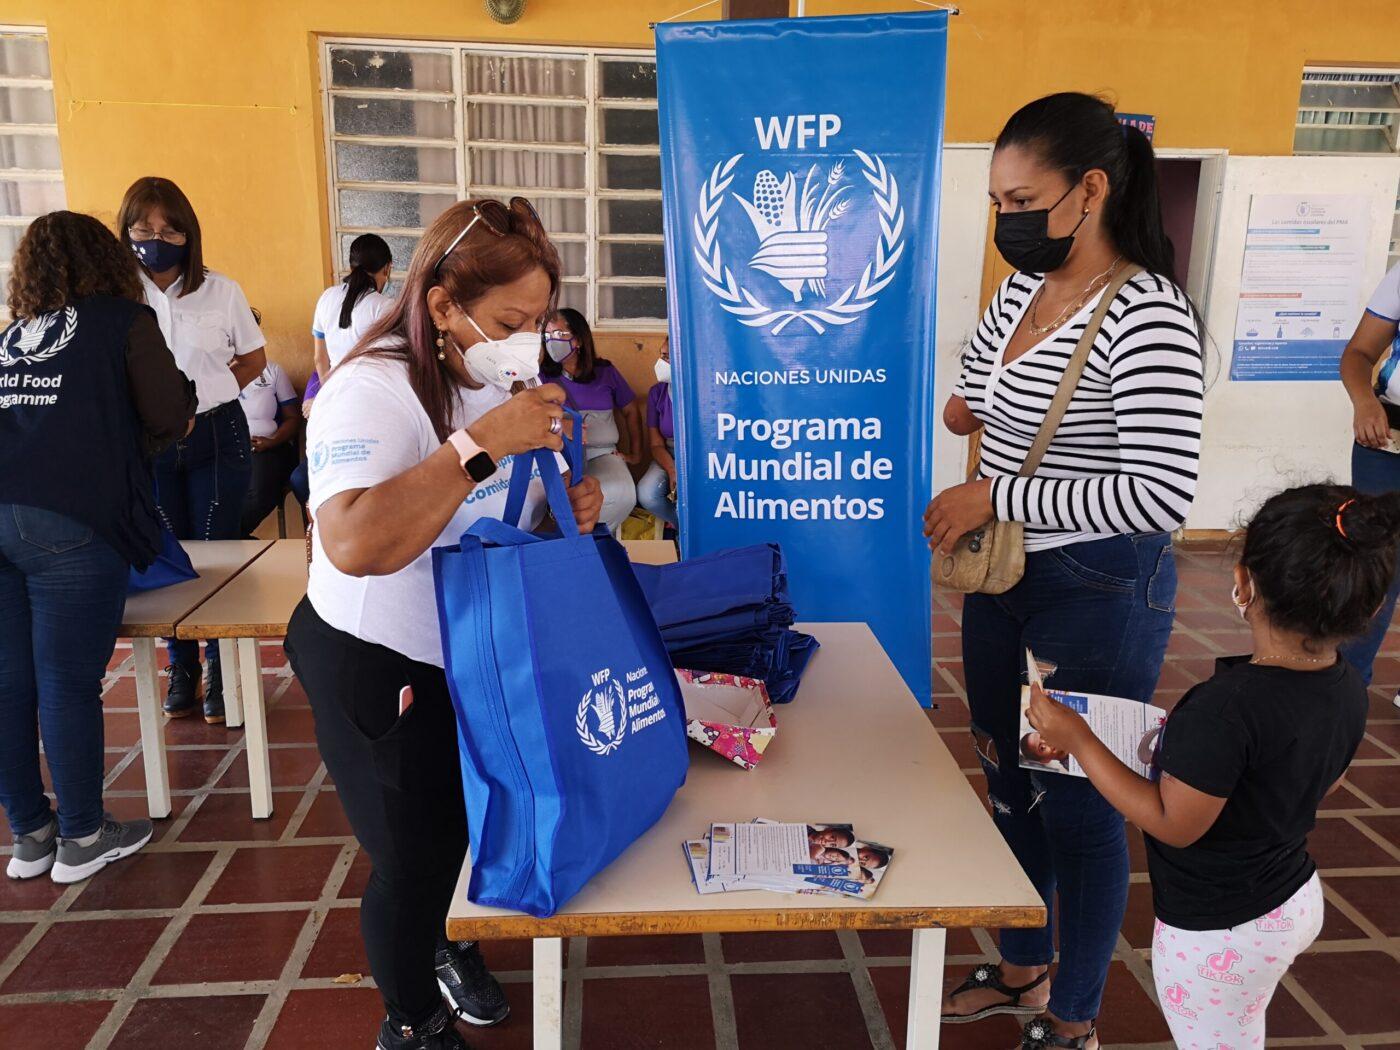 women in health masks exchanging bag of food